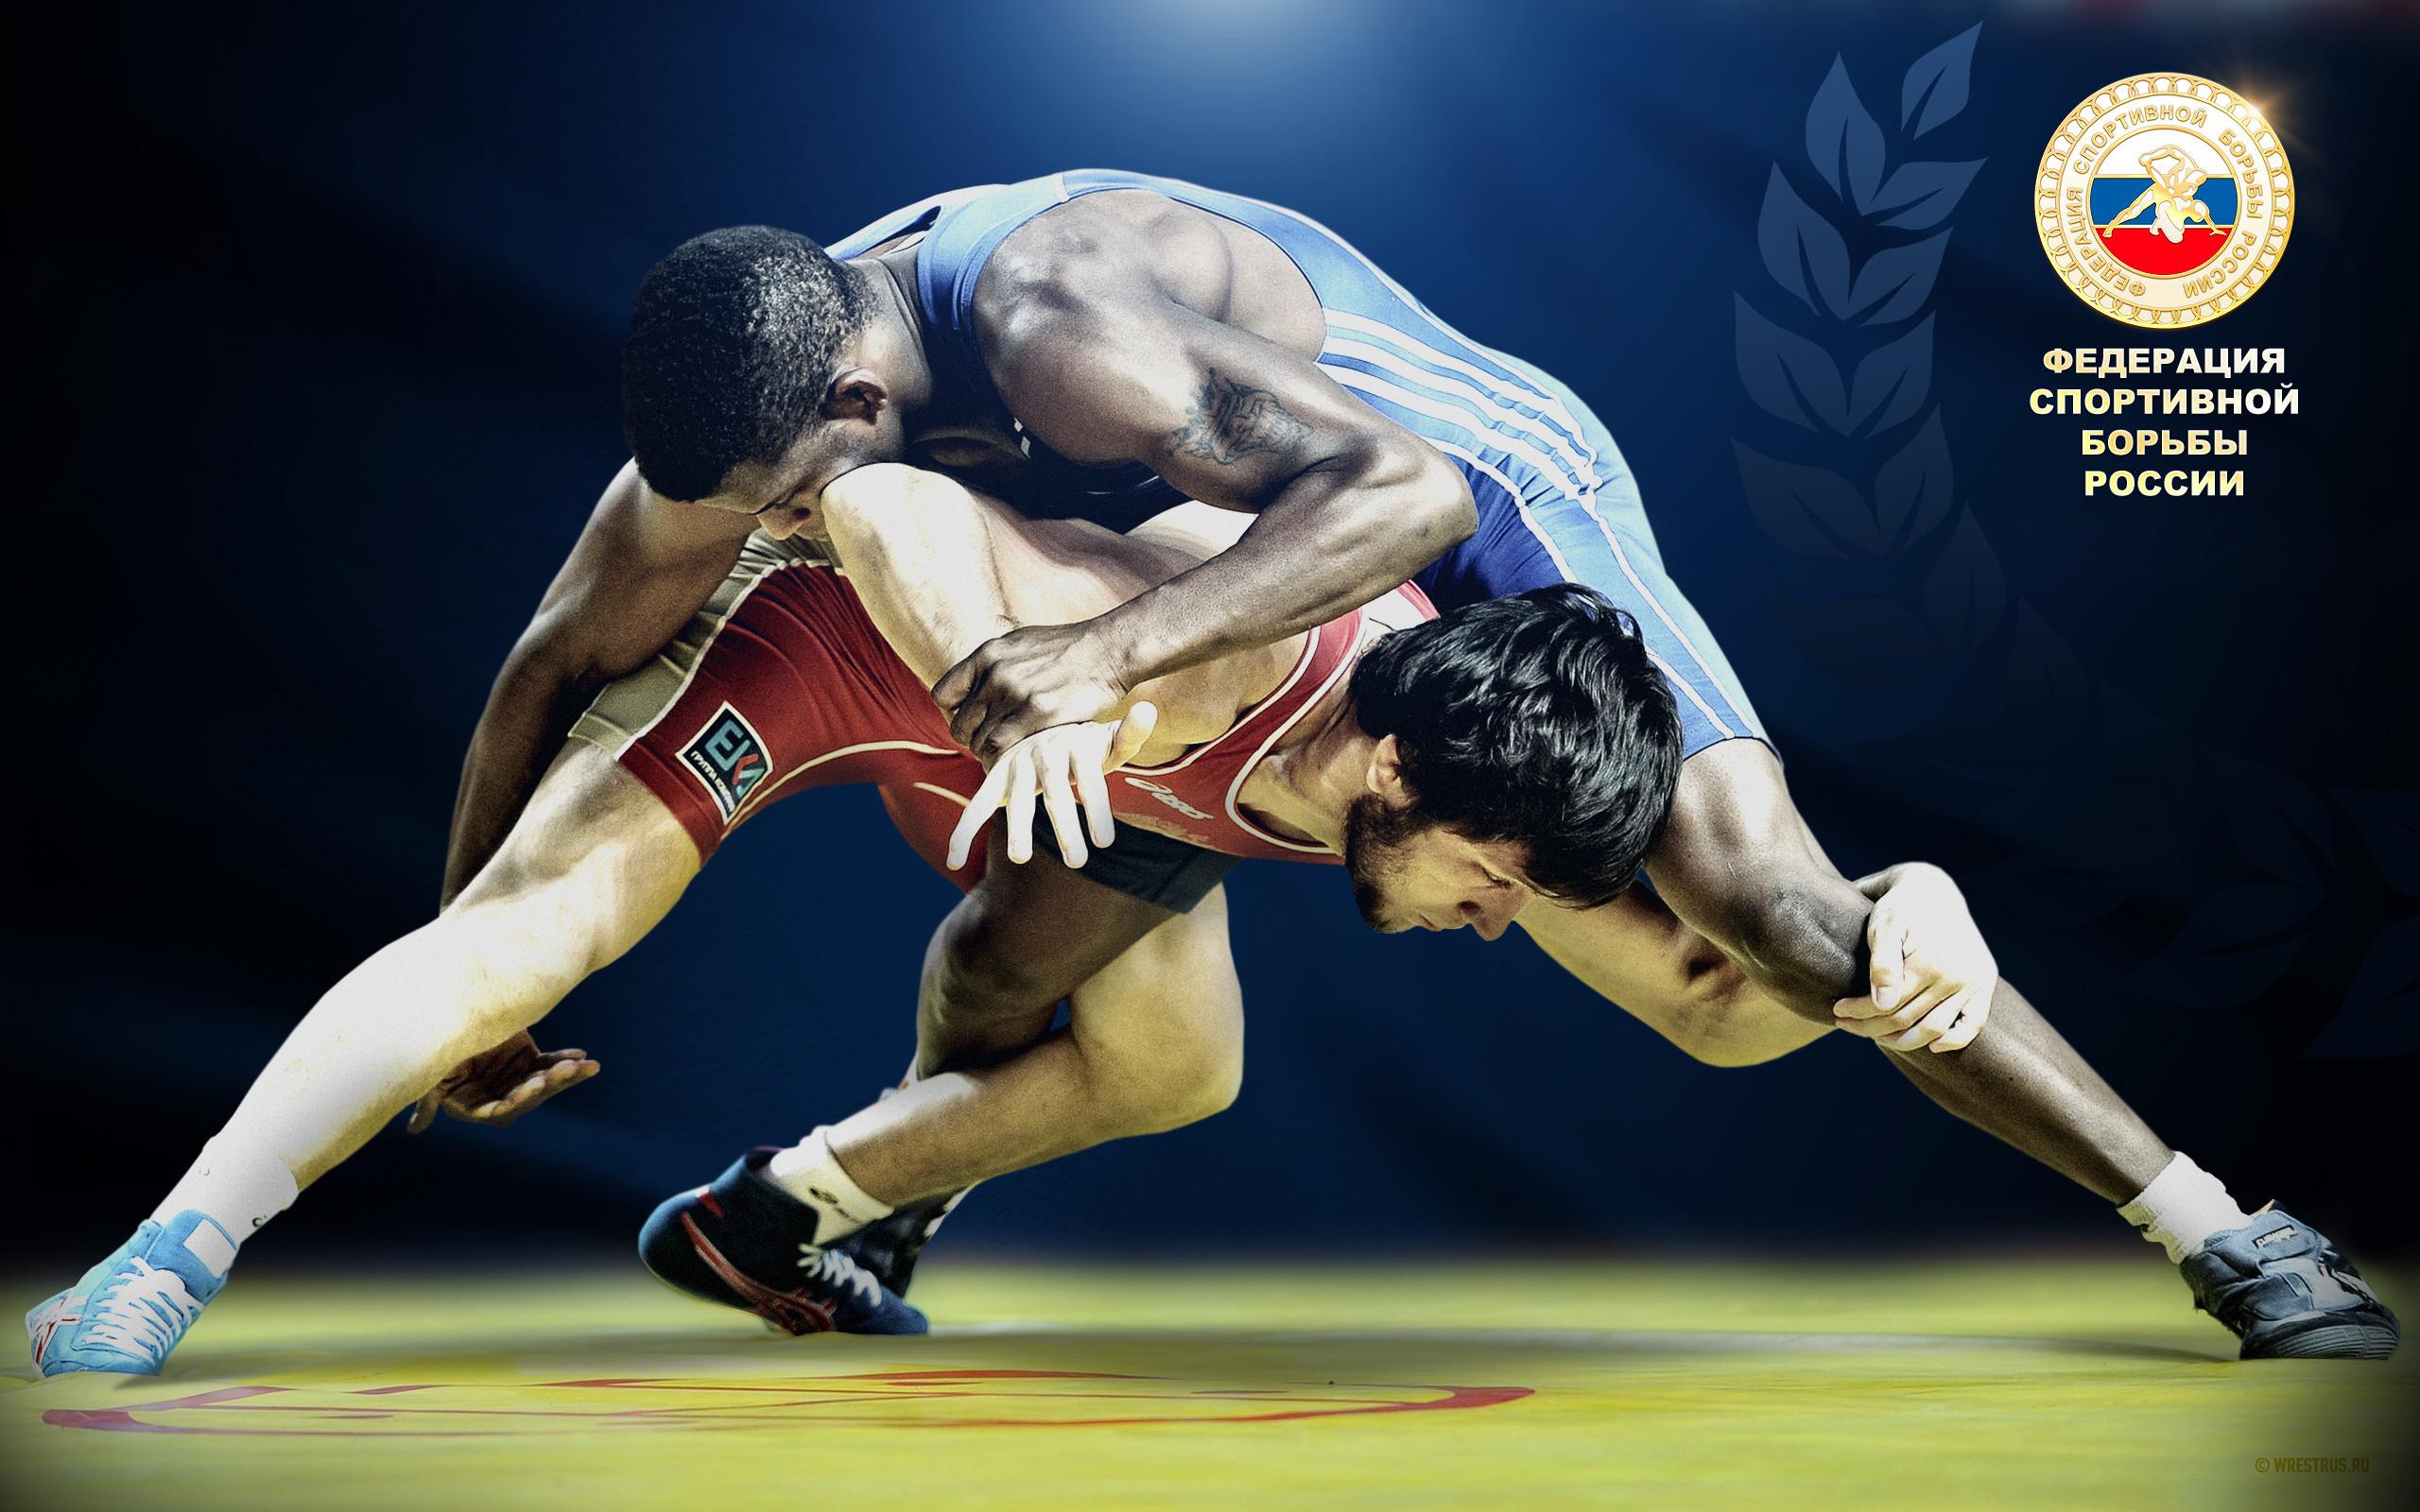 Sports Resistance Wrestling Wrestler Individual Contact Sport Sanshou Combat Greco Roman Held In